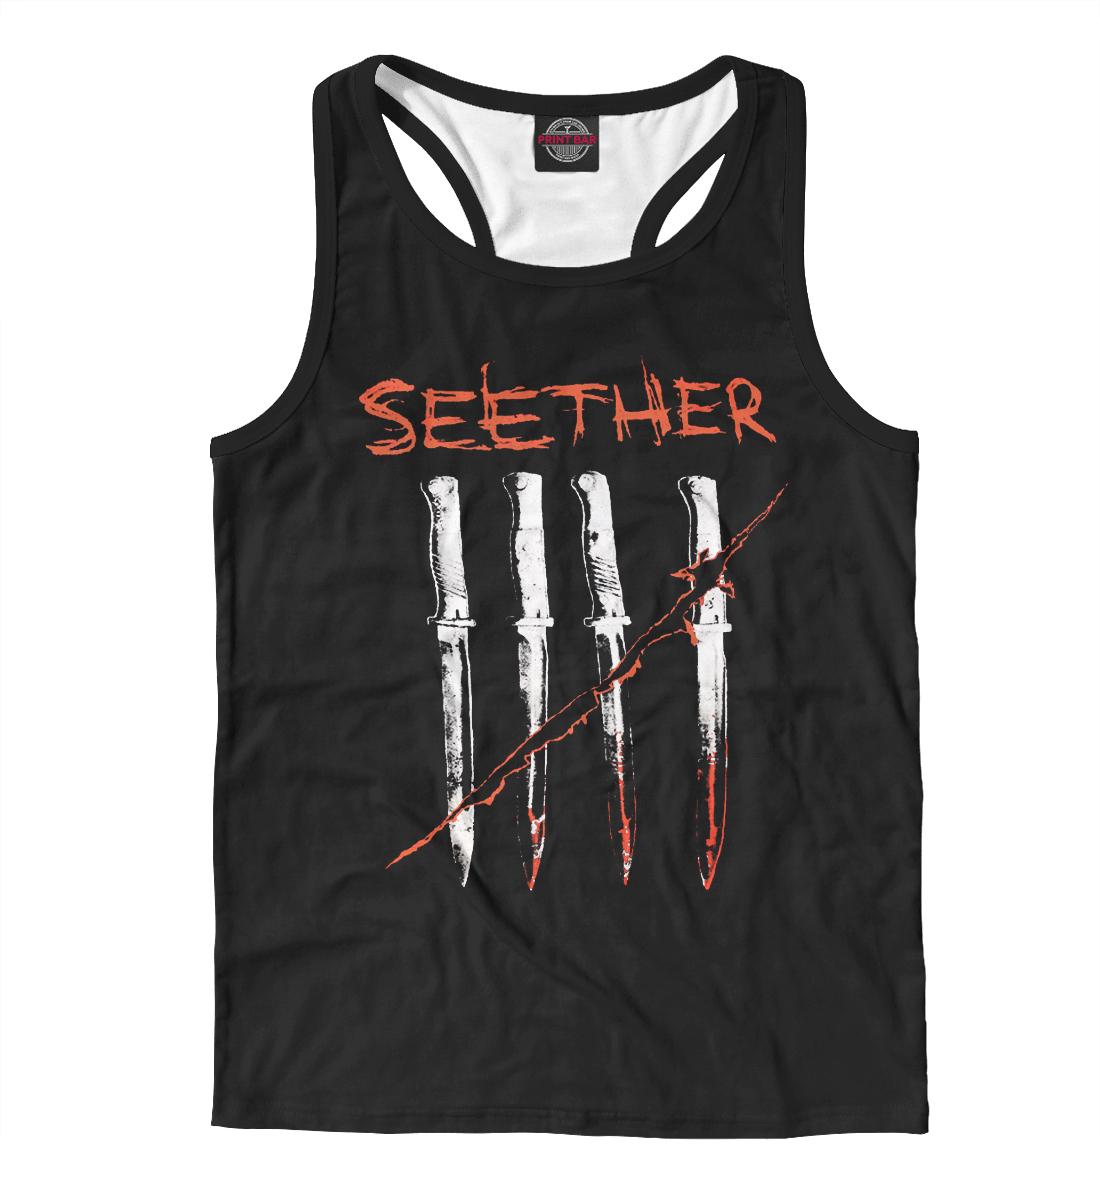 Купить Seether, Printbar, Майки борцовки, MZK-341707-mayb-2